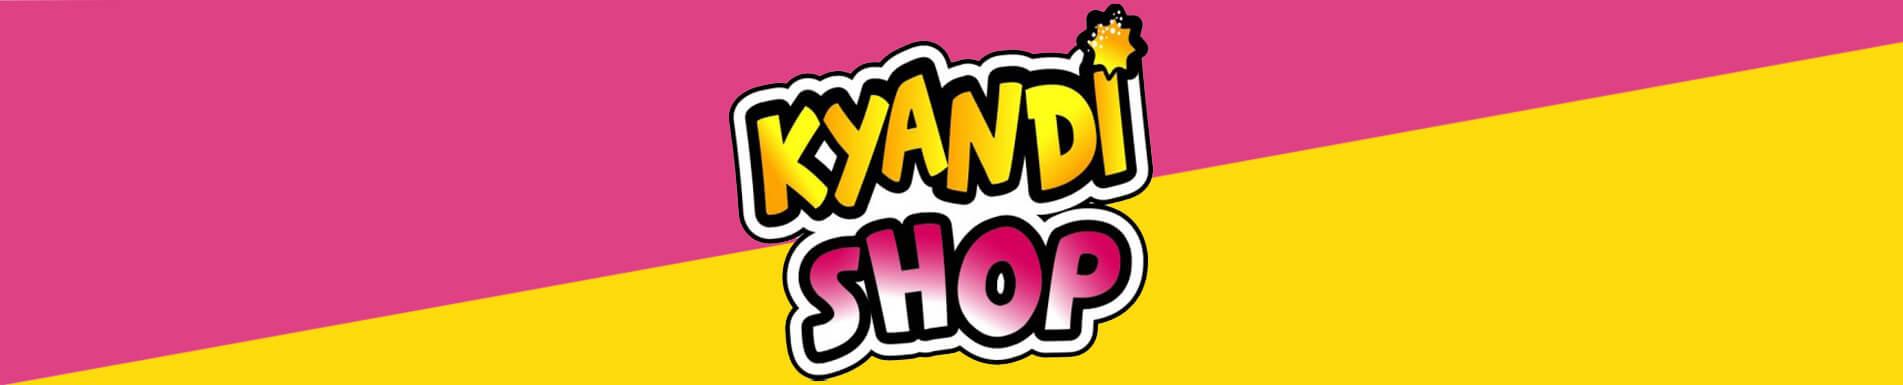 logo kyandishop